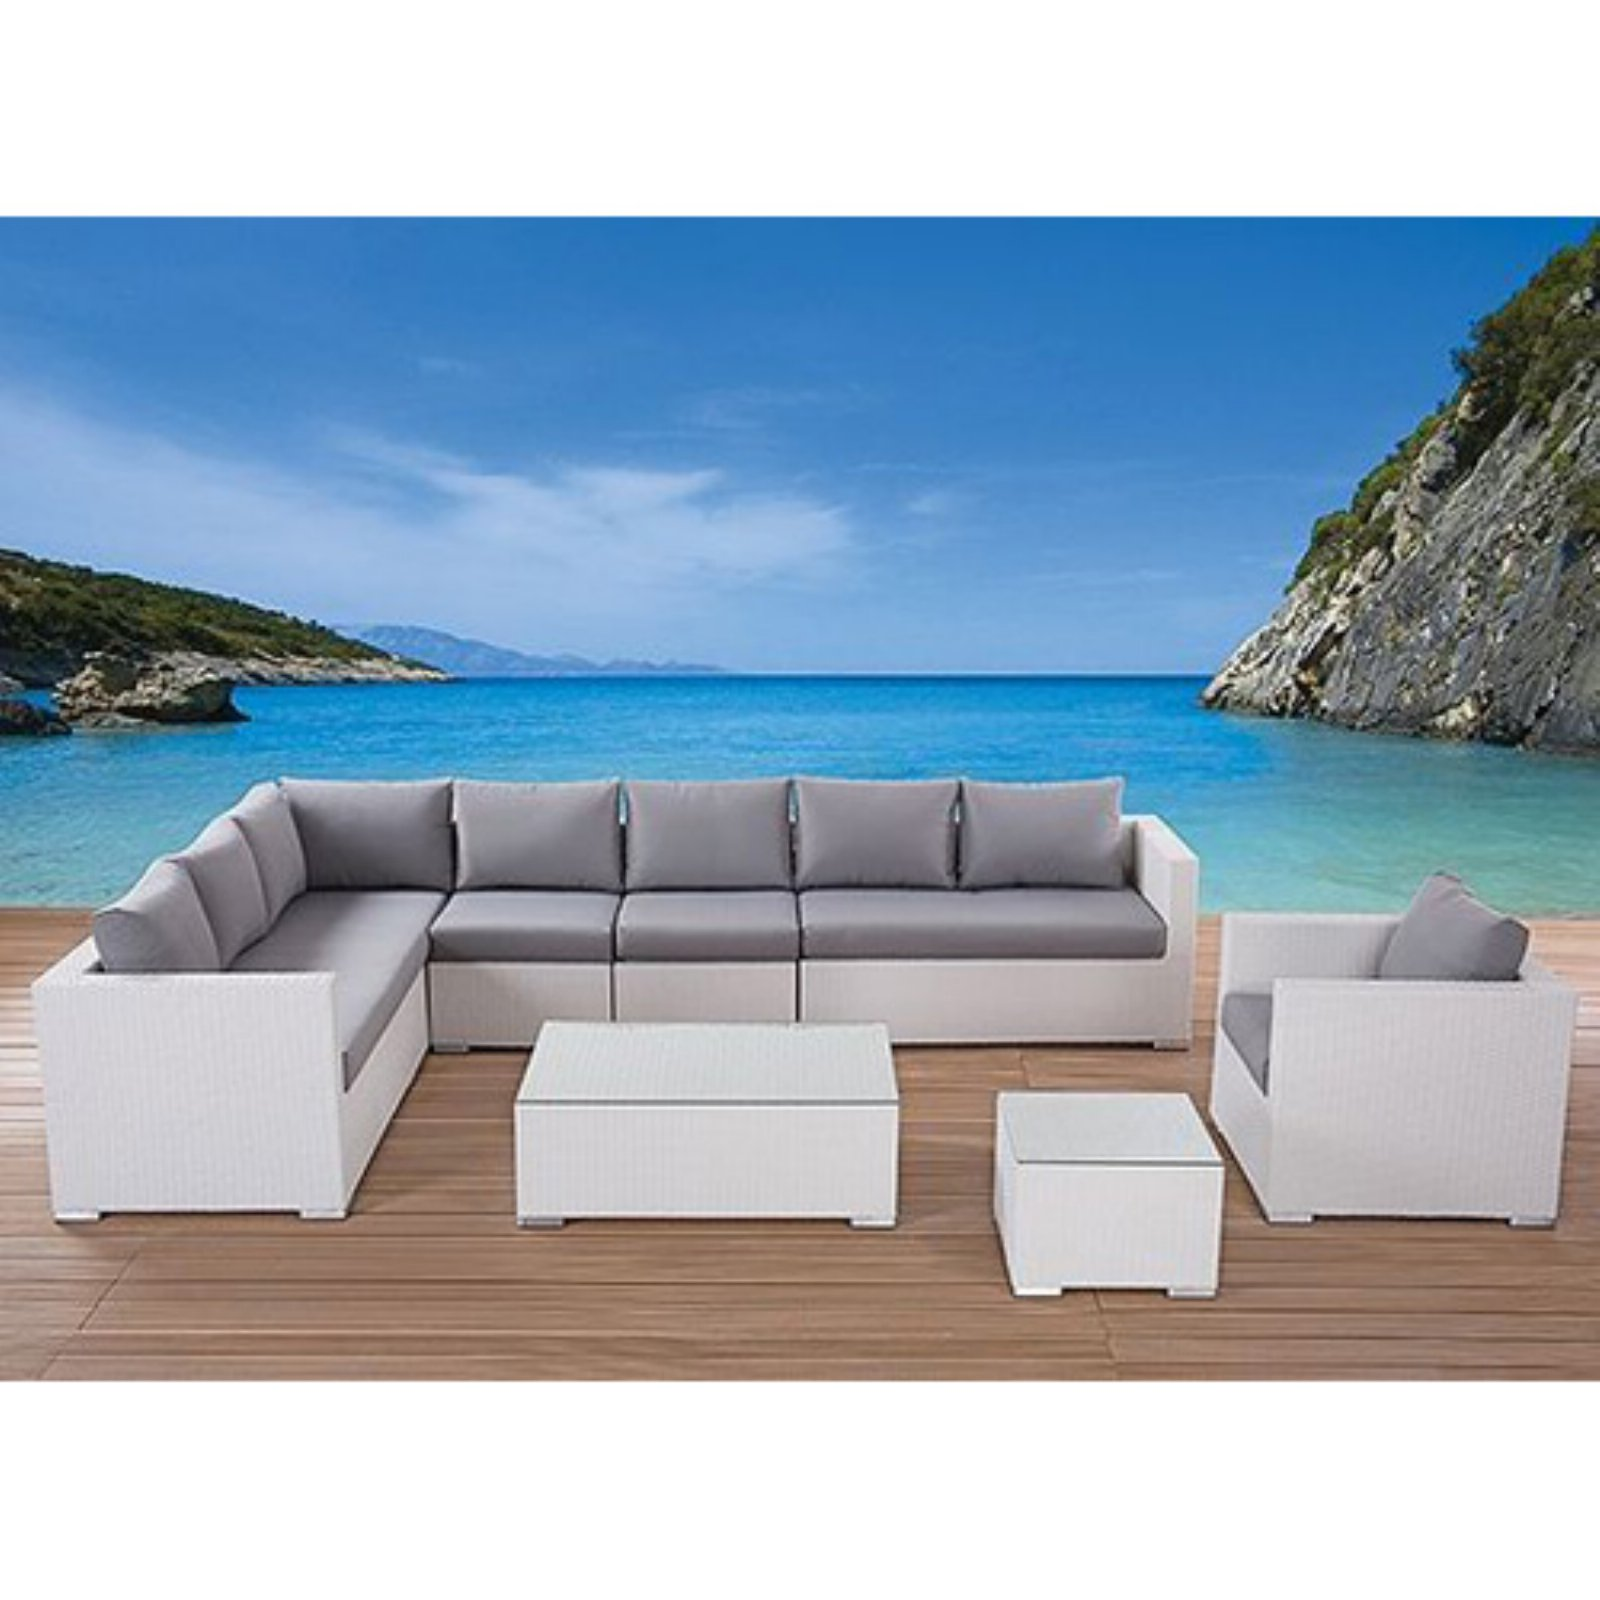 Velago Generoso Wicker 7 Piece Patio Conversation Set by 1291 Furnitures Inc